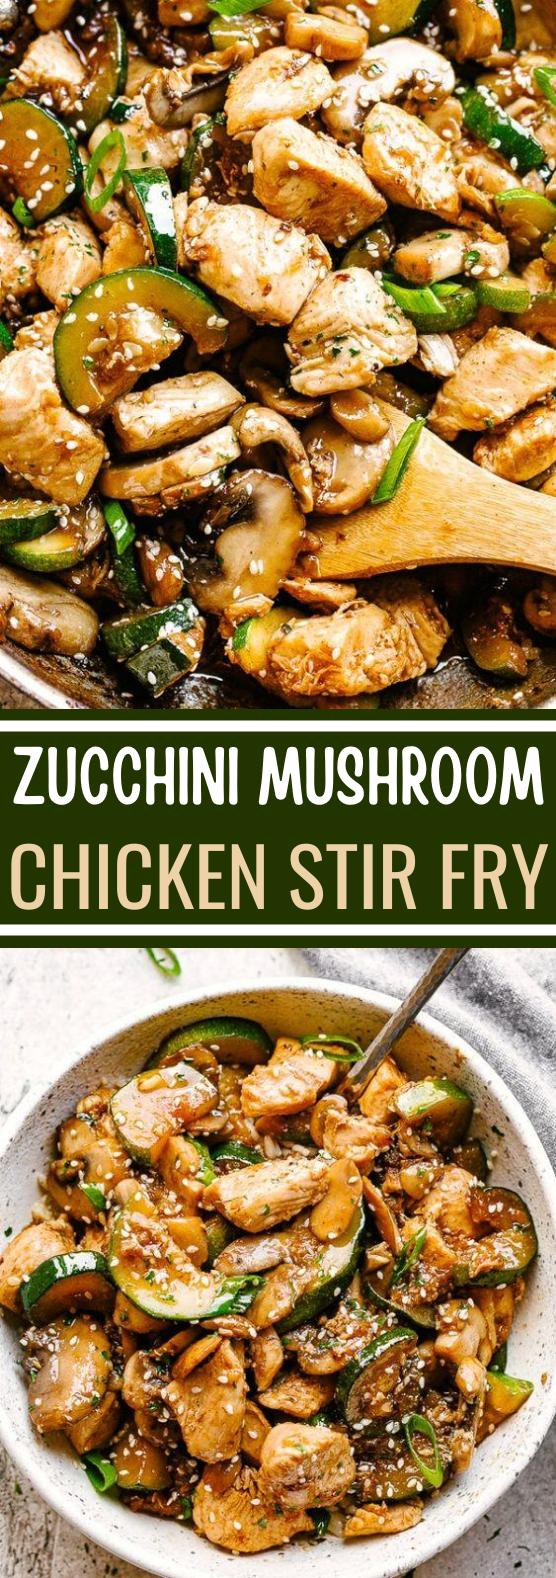 Zucchini Mushroom Chicken Stir Fry #healthy #recipes #lowcarb #diet #dinner